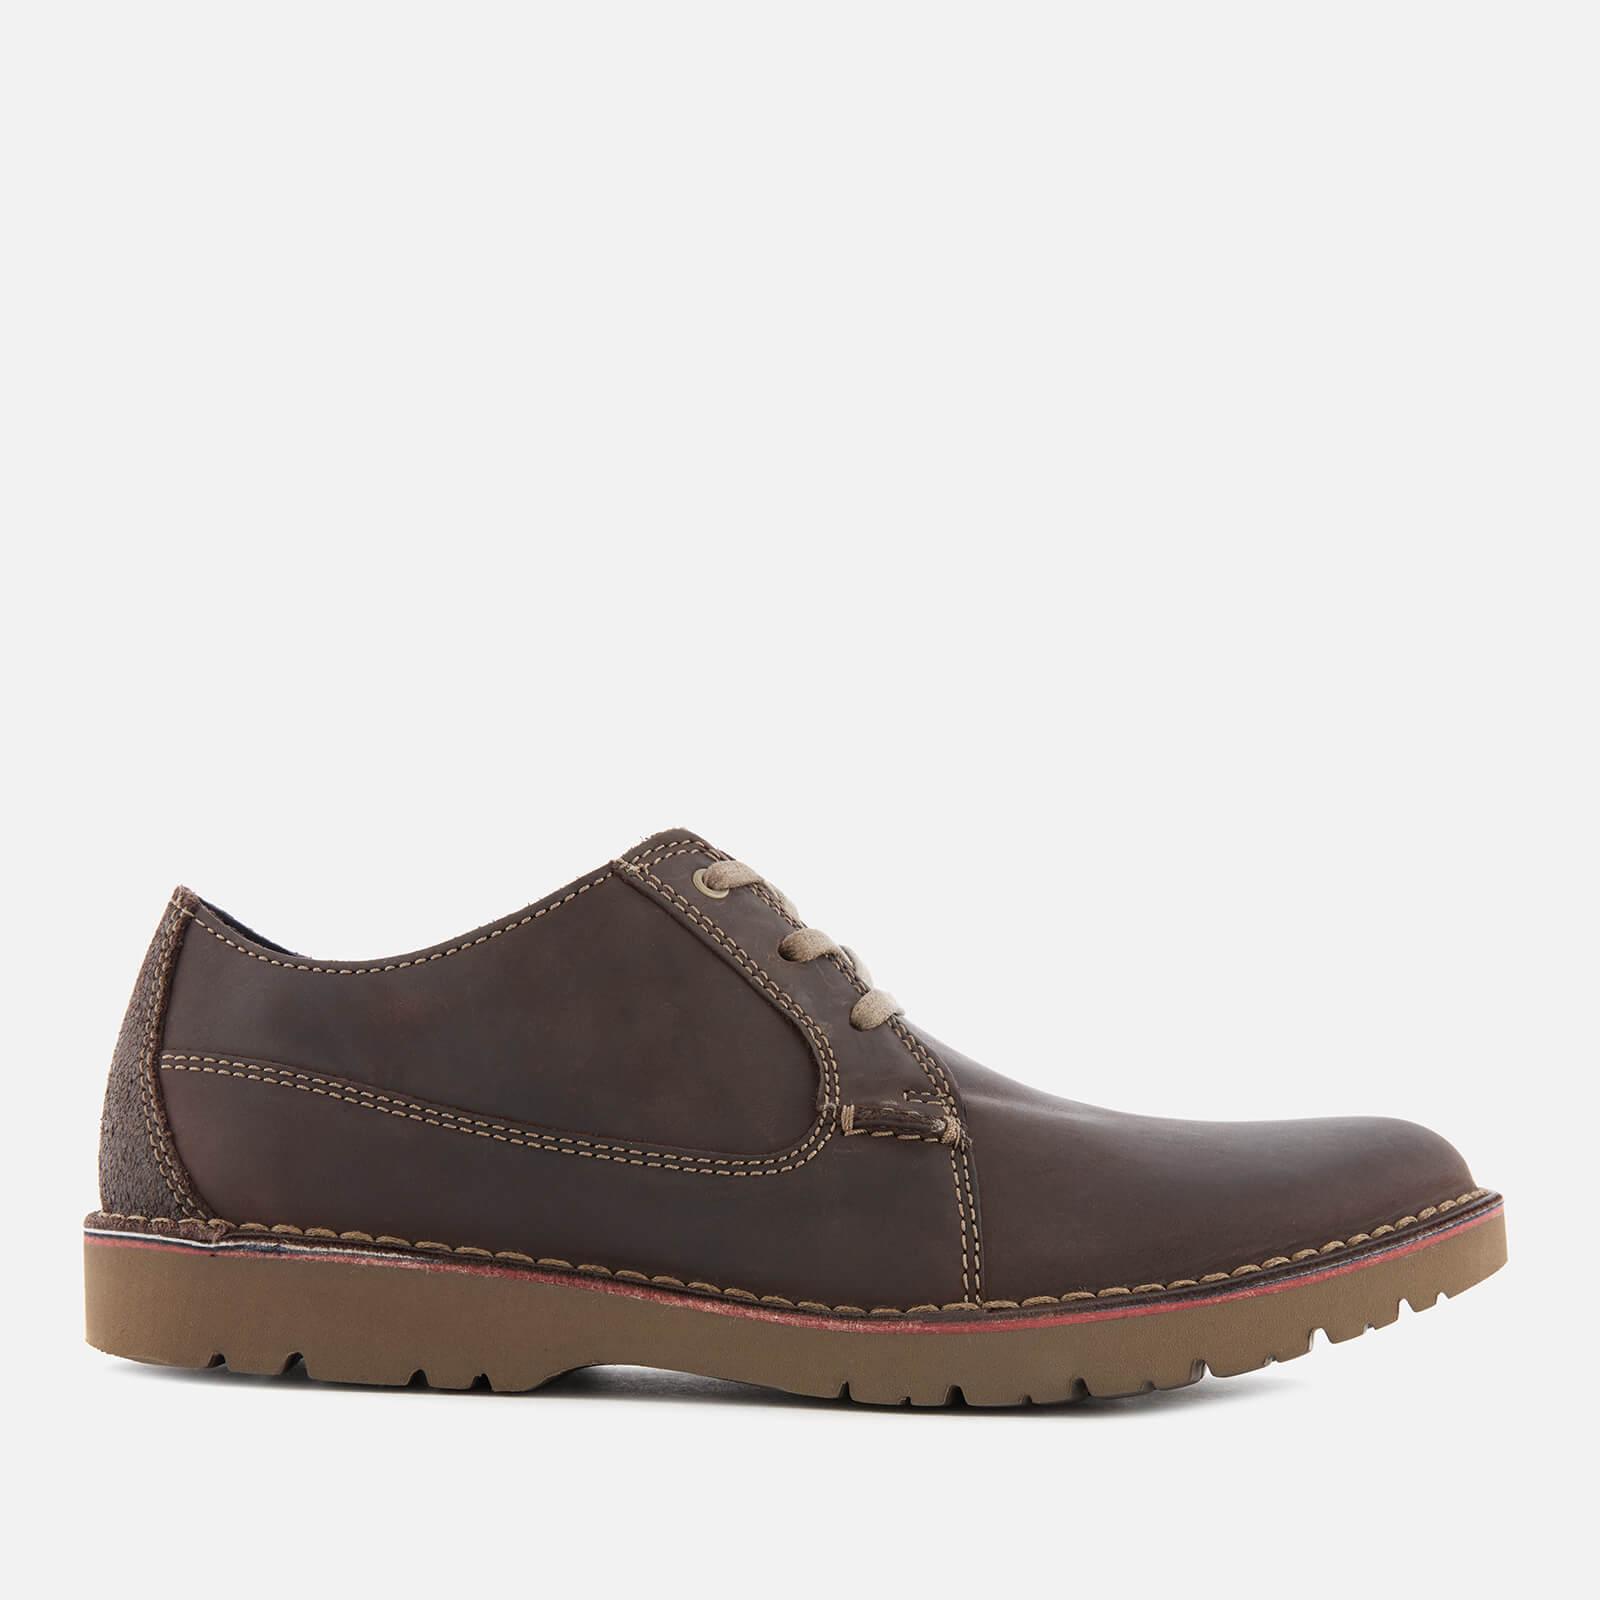 Clarks Men's Vargo Plain Leather Derby Shoes - Dark Brown - UK 11